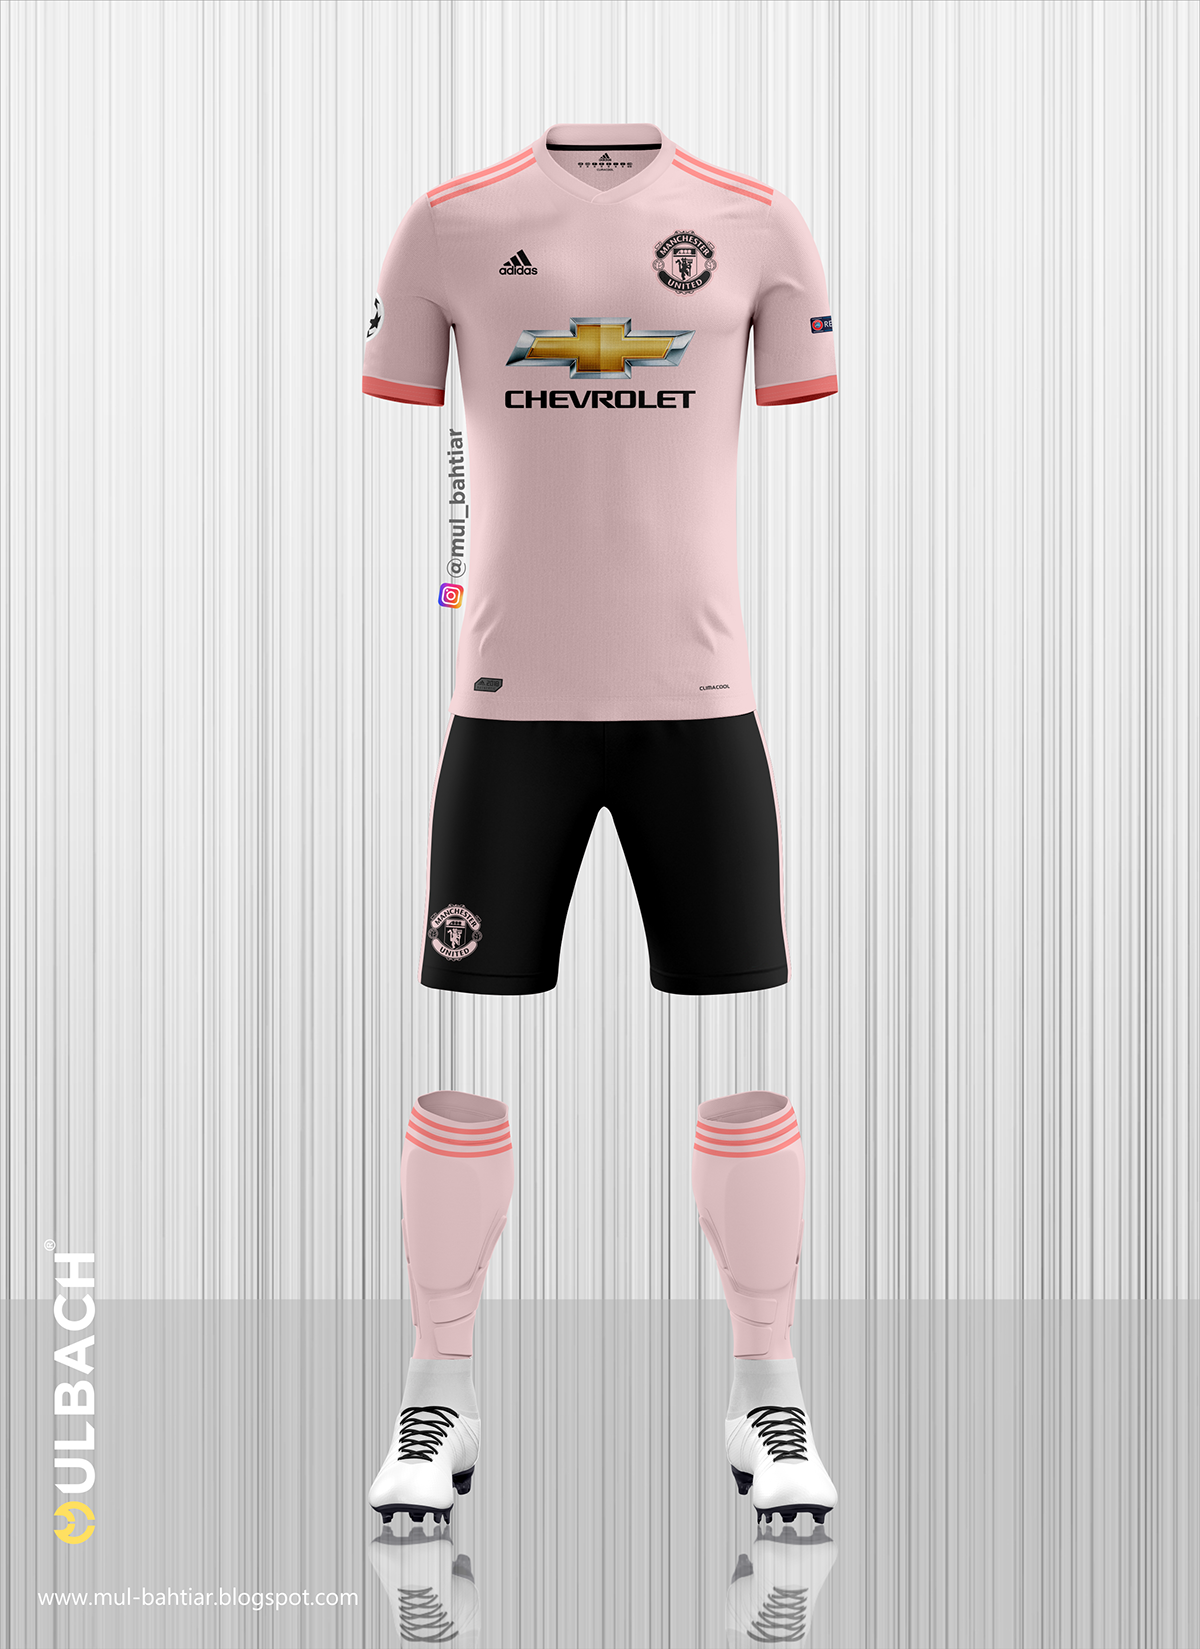 265c42be1 Manchester United Shirt 2019 Away - Nils Stucki Kieferorthopäde